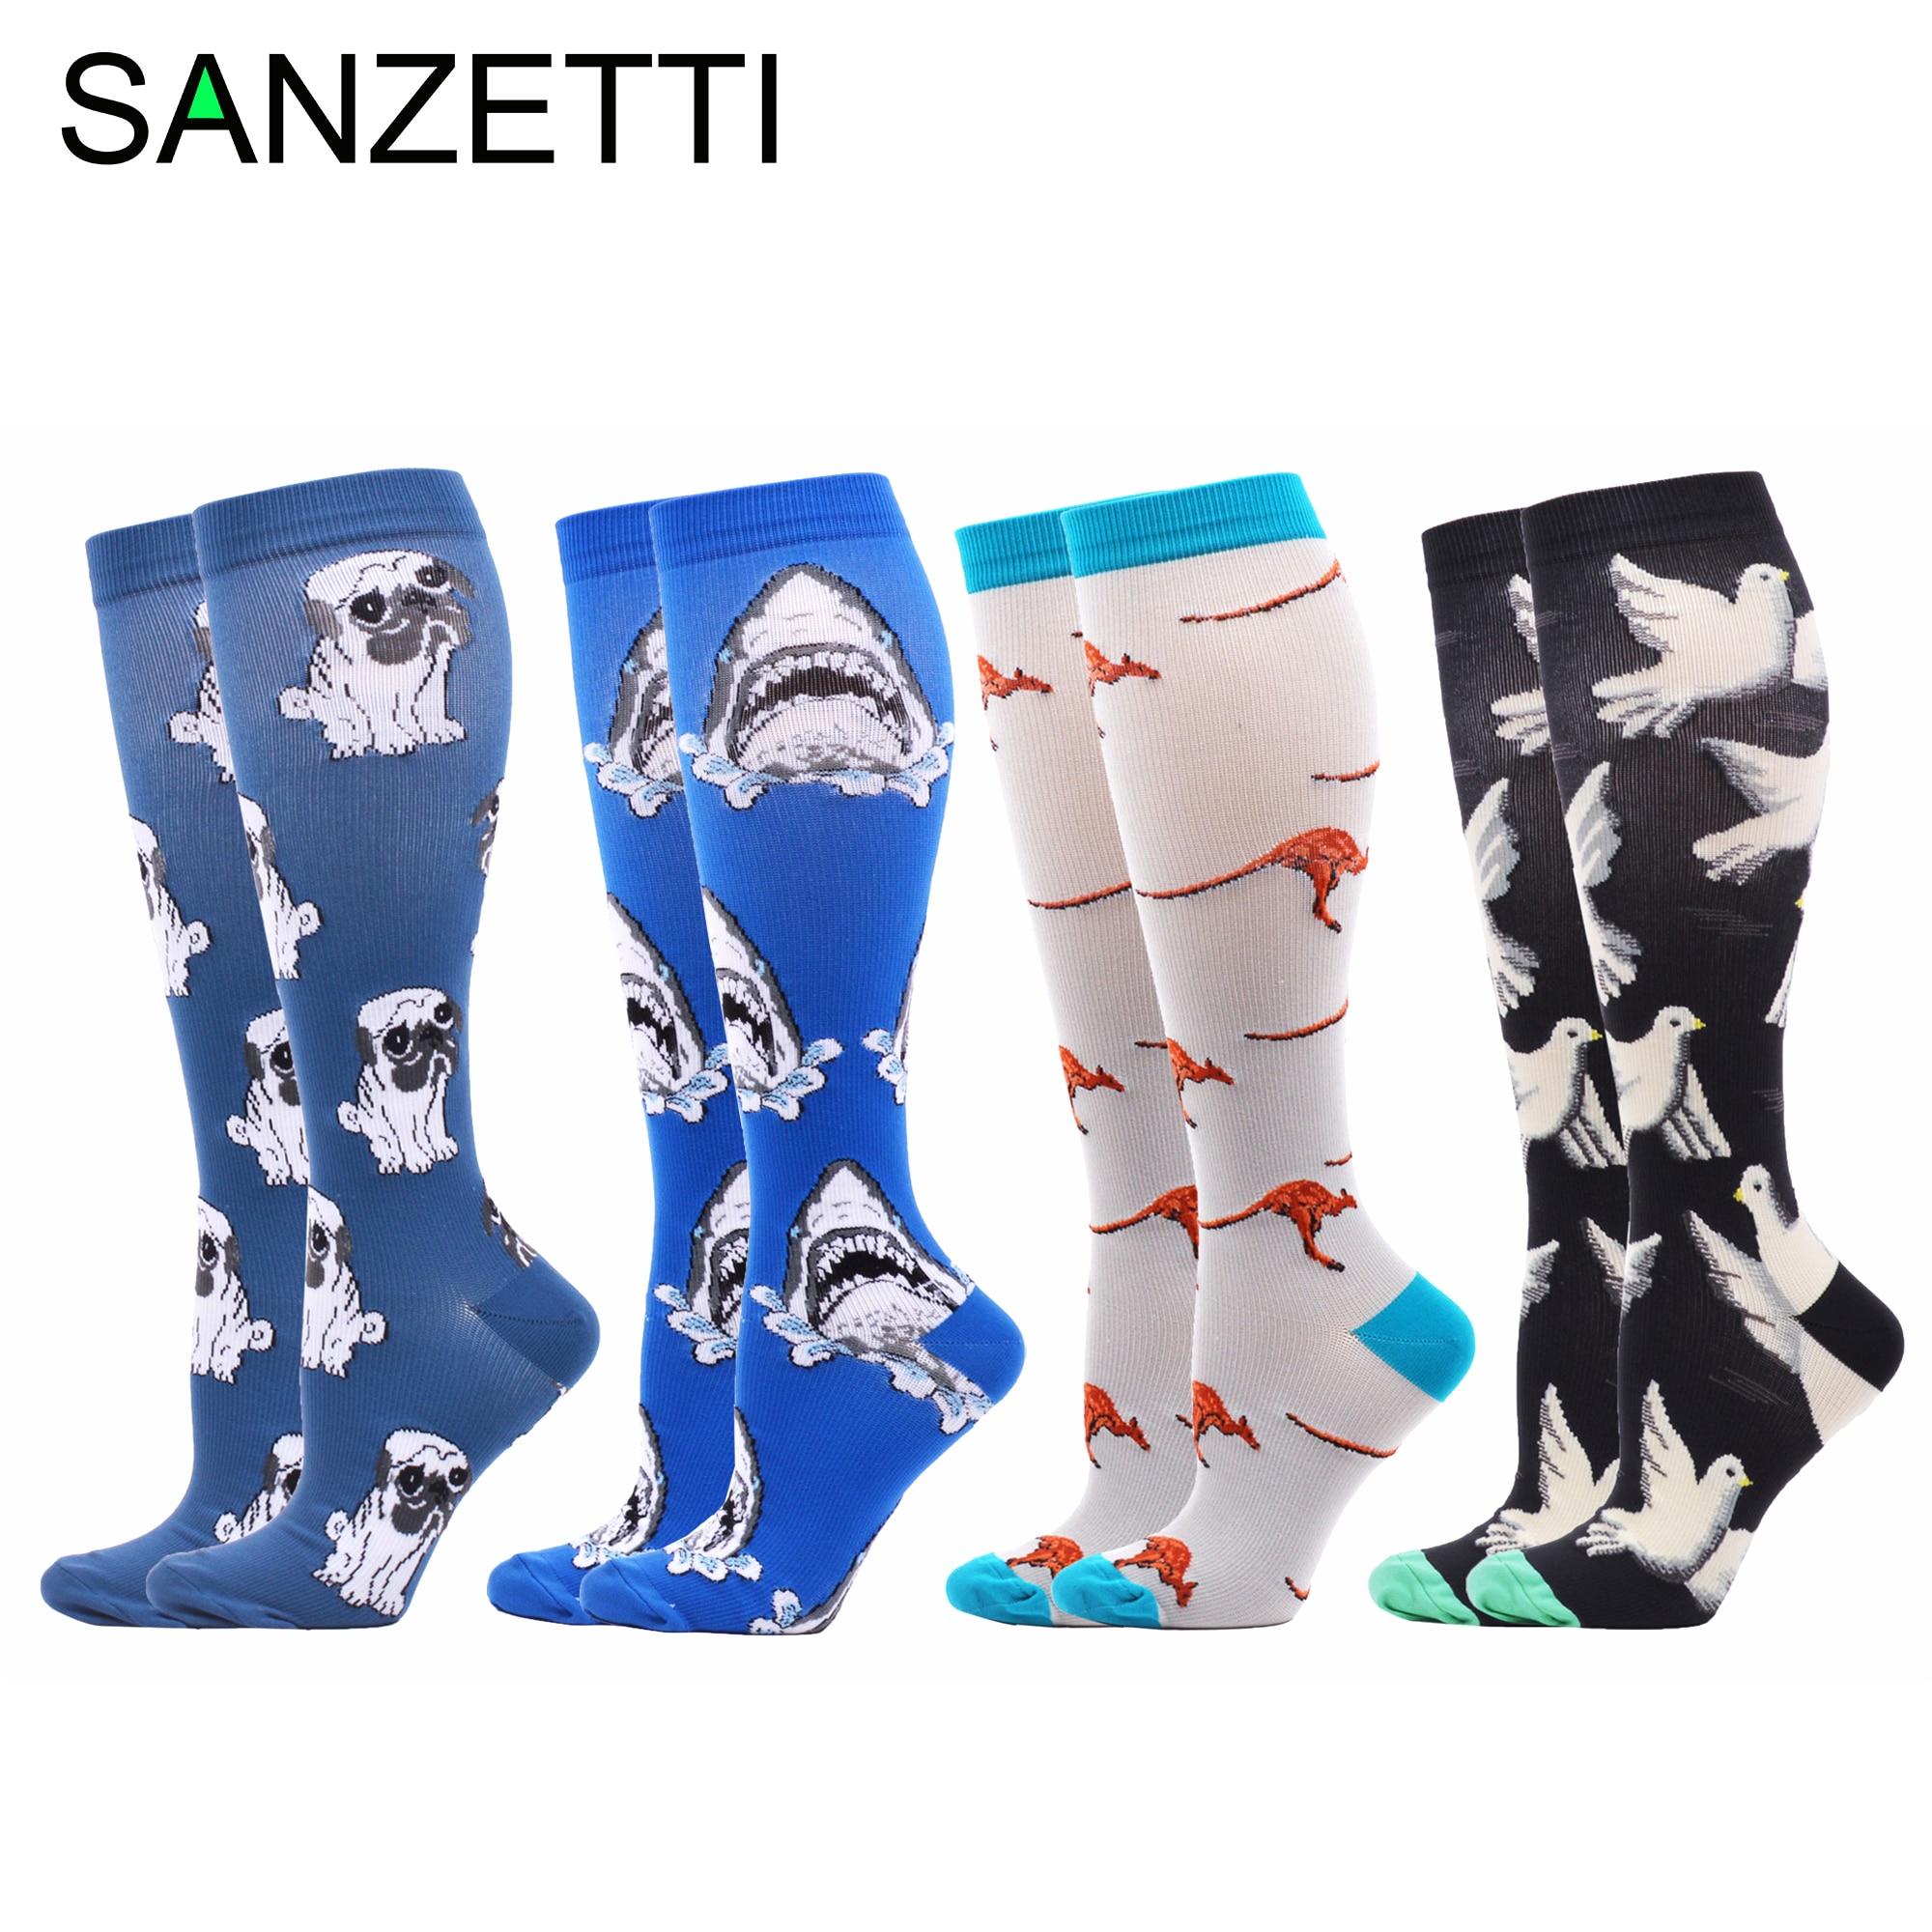 SANZETTI 4 Pairs Hot Women Dog Shark Animal Striped Combed Cotton Compression Socks Below Knee Anti-Fatigue Long Colorful Socks